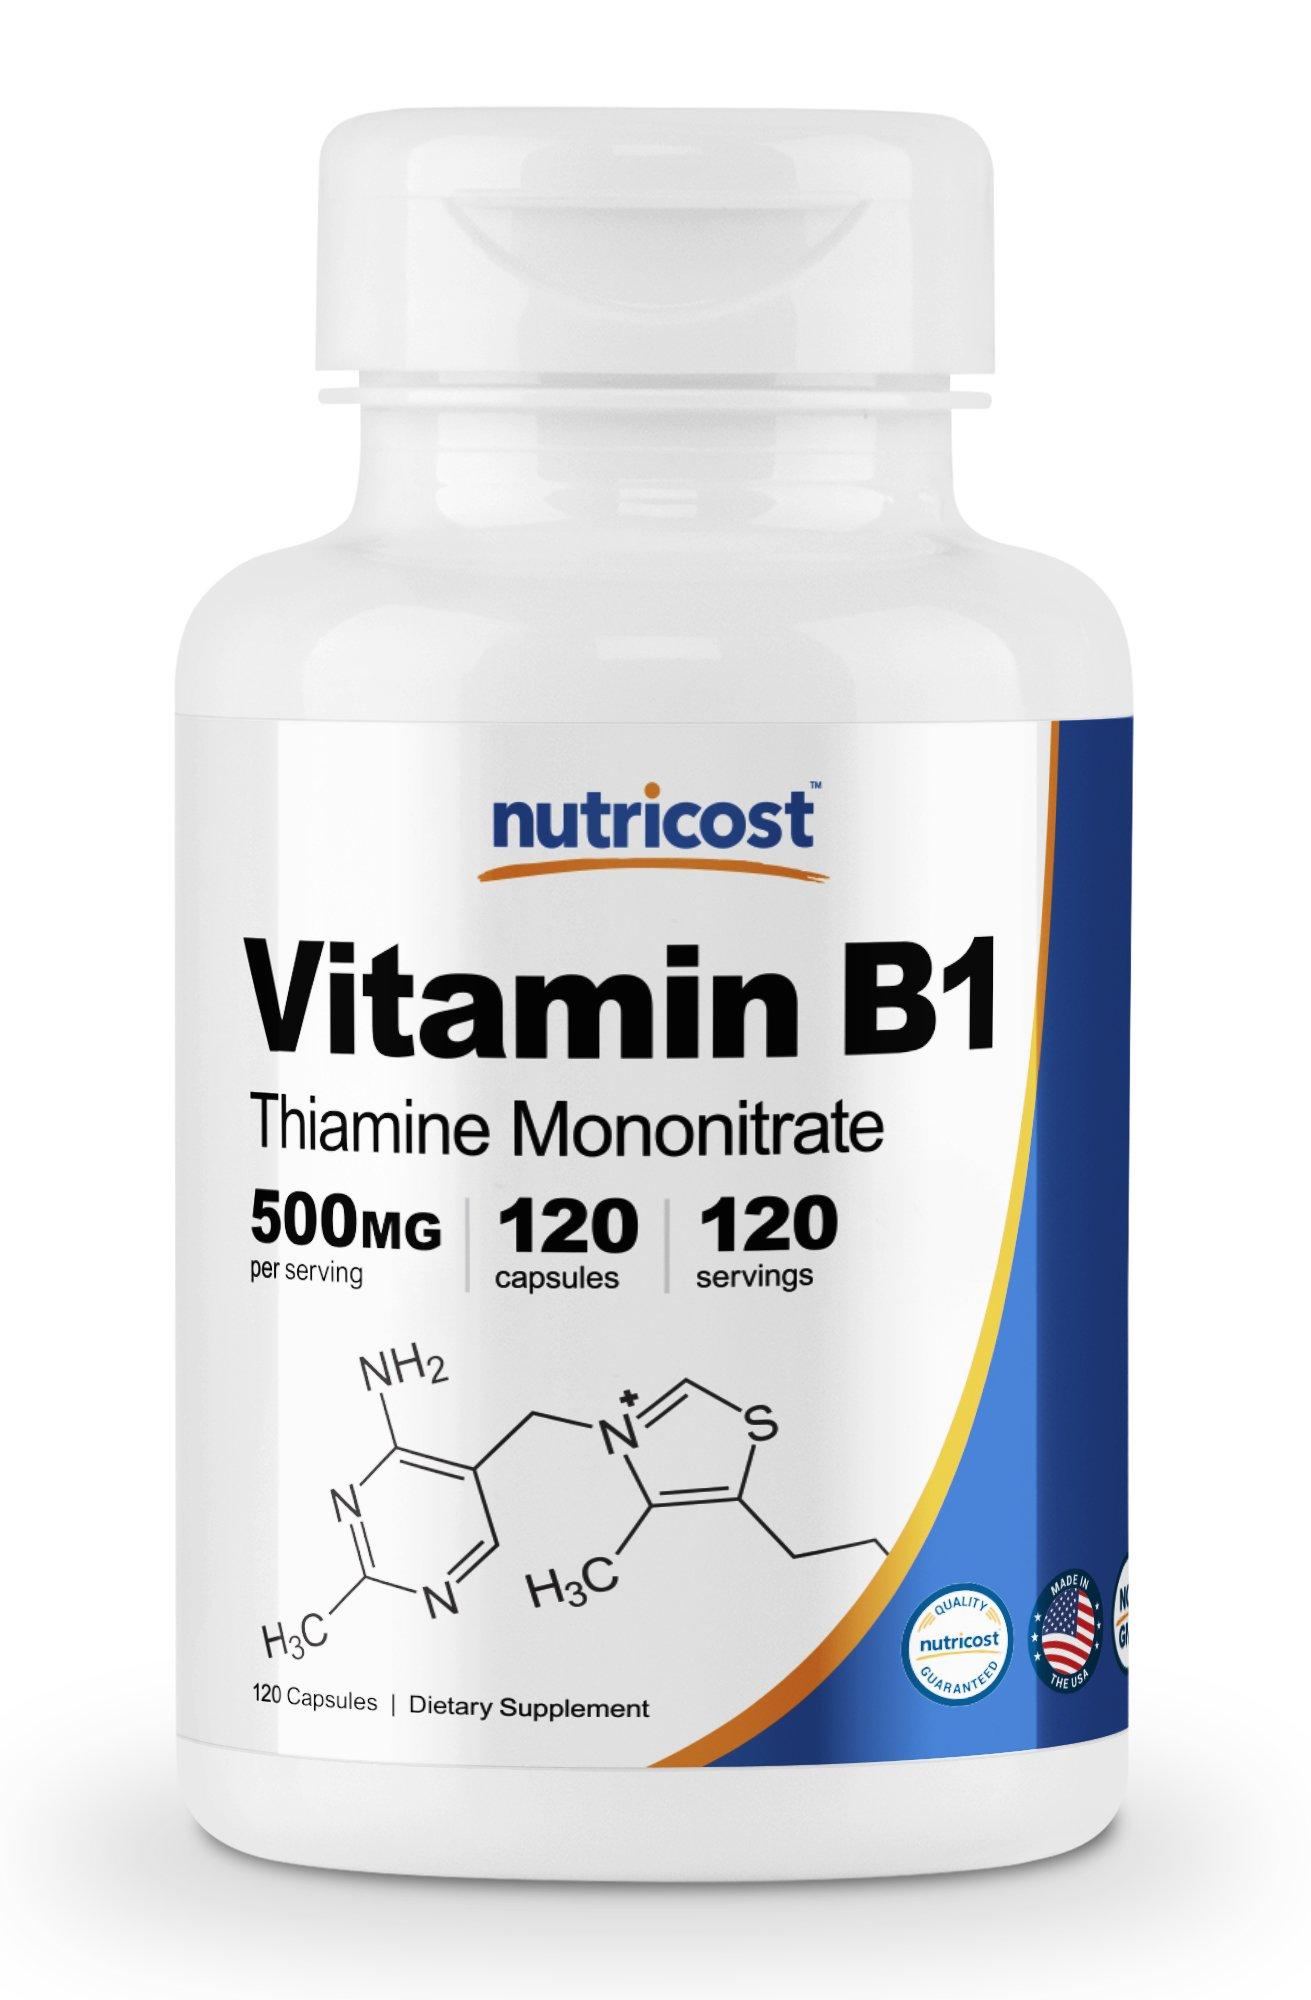 Nutricost Vitamin B1 (Thiamine) 500mg, 120 Capsules